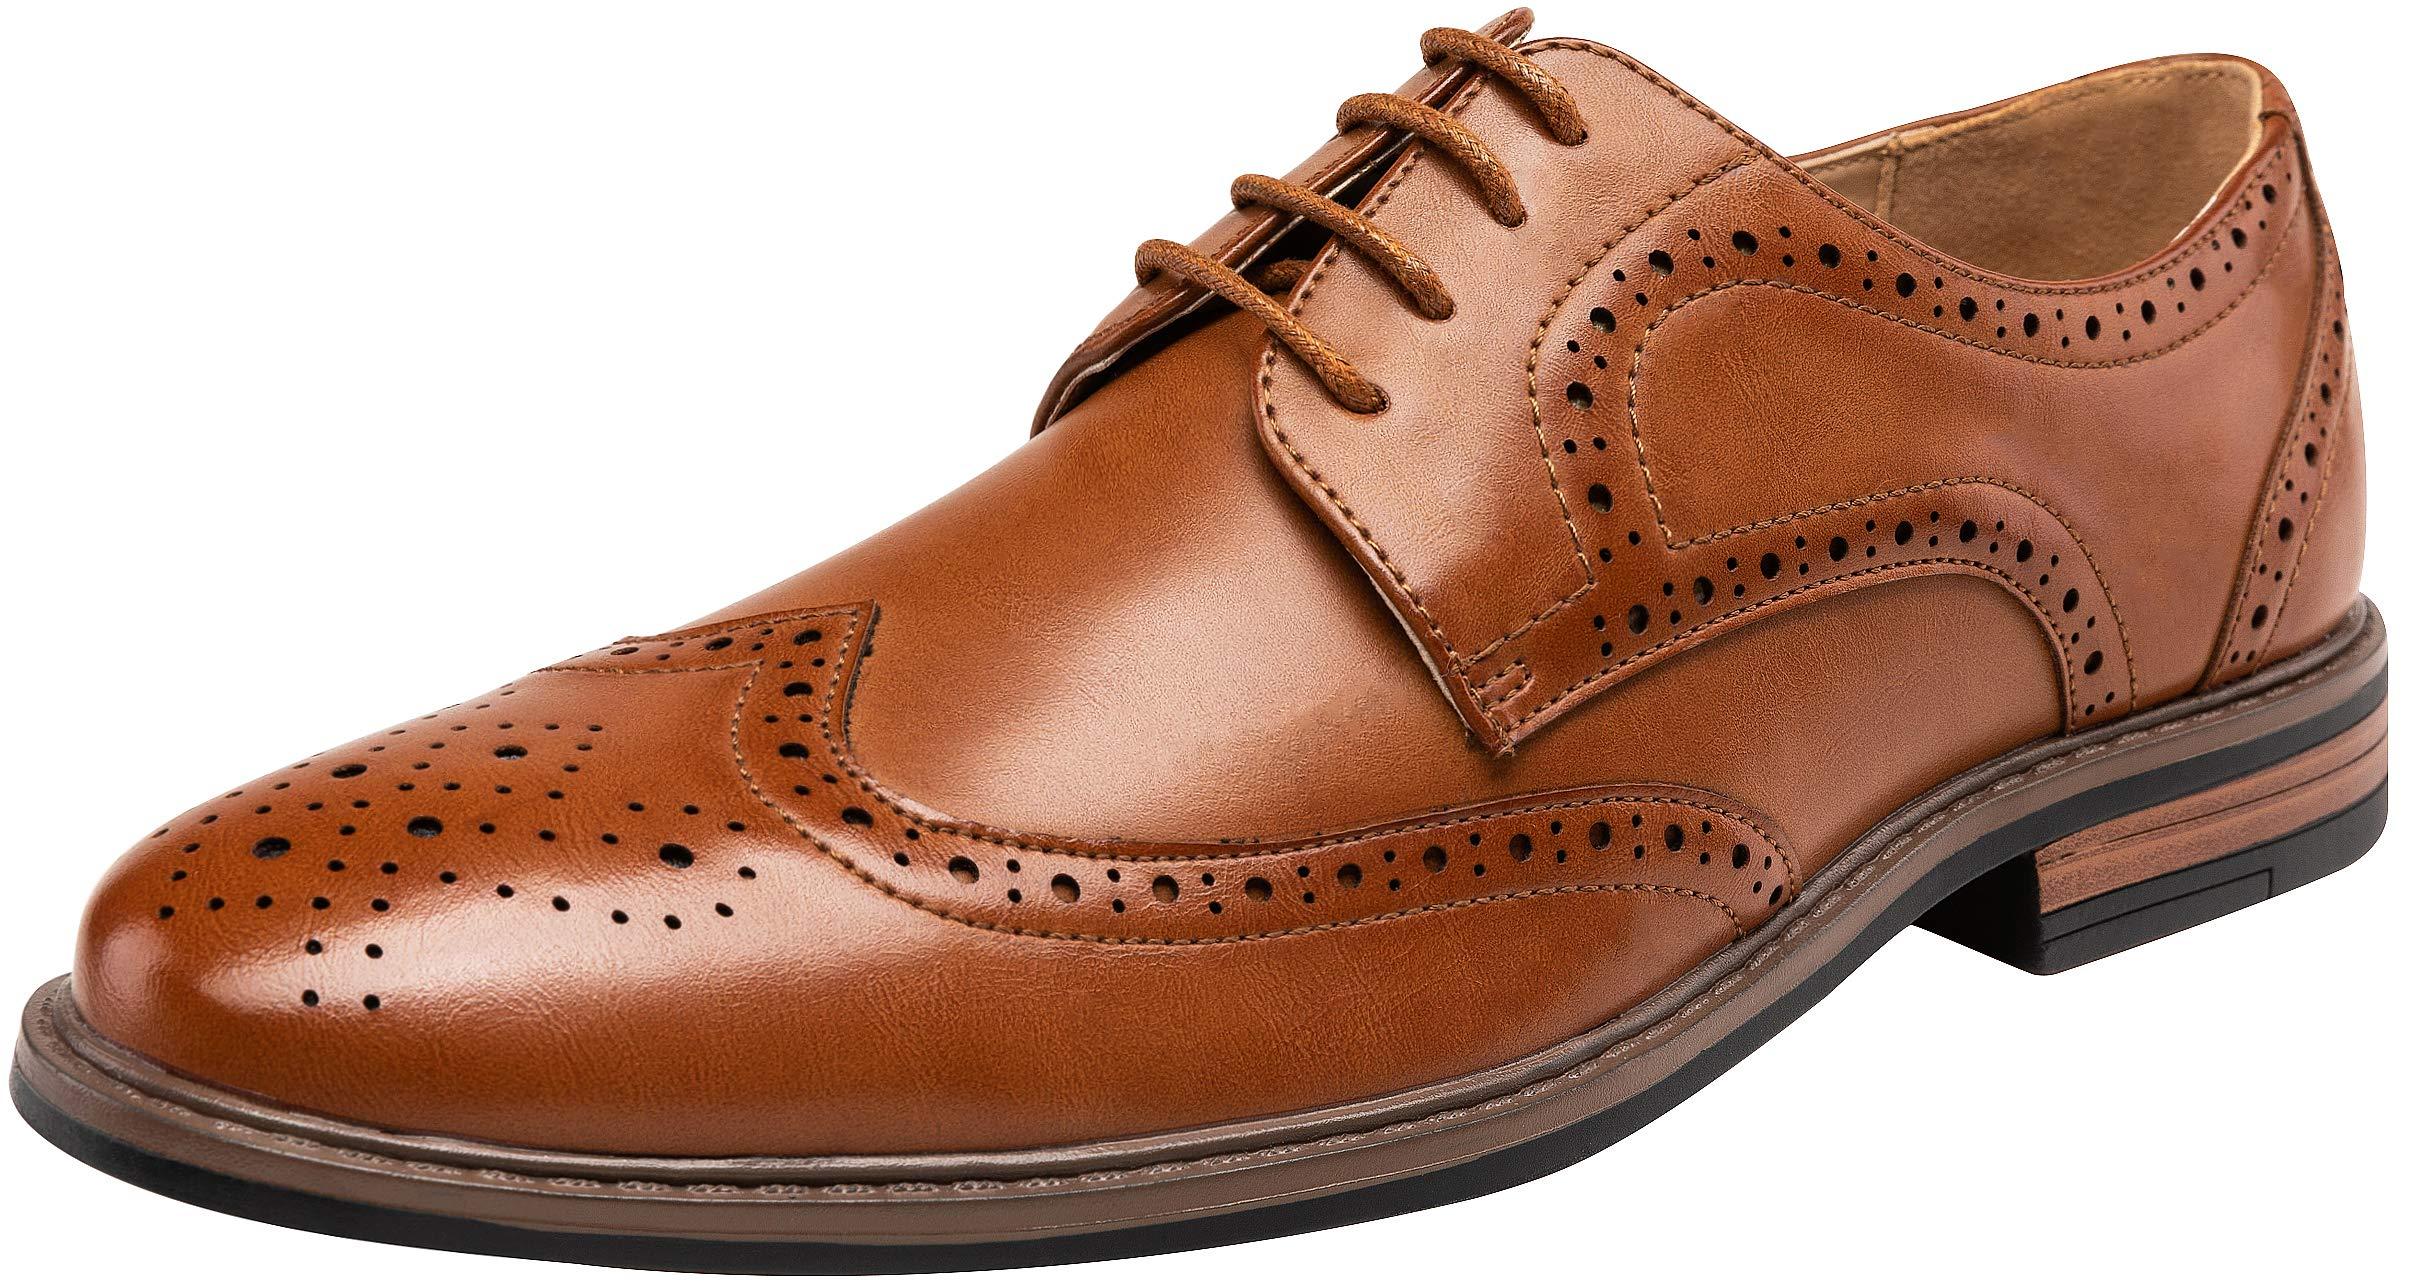 VEPOSE Men's Dress Shoes Classic Brogue Oxford Business Wingtip Shoes